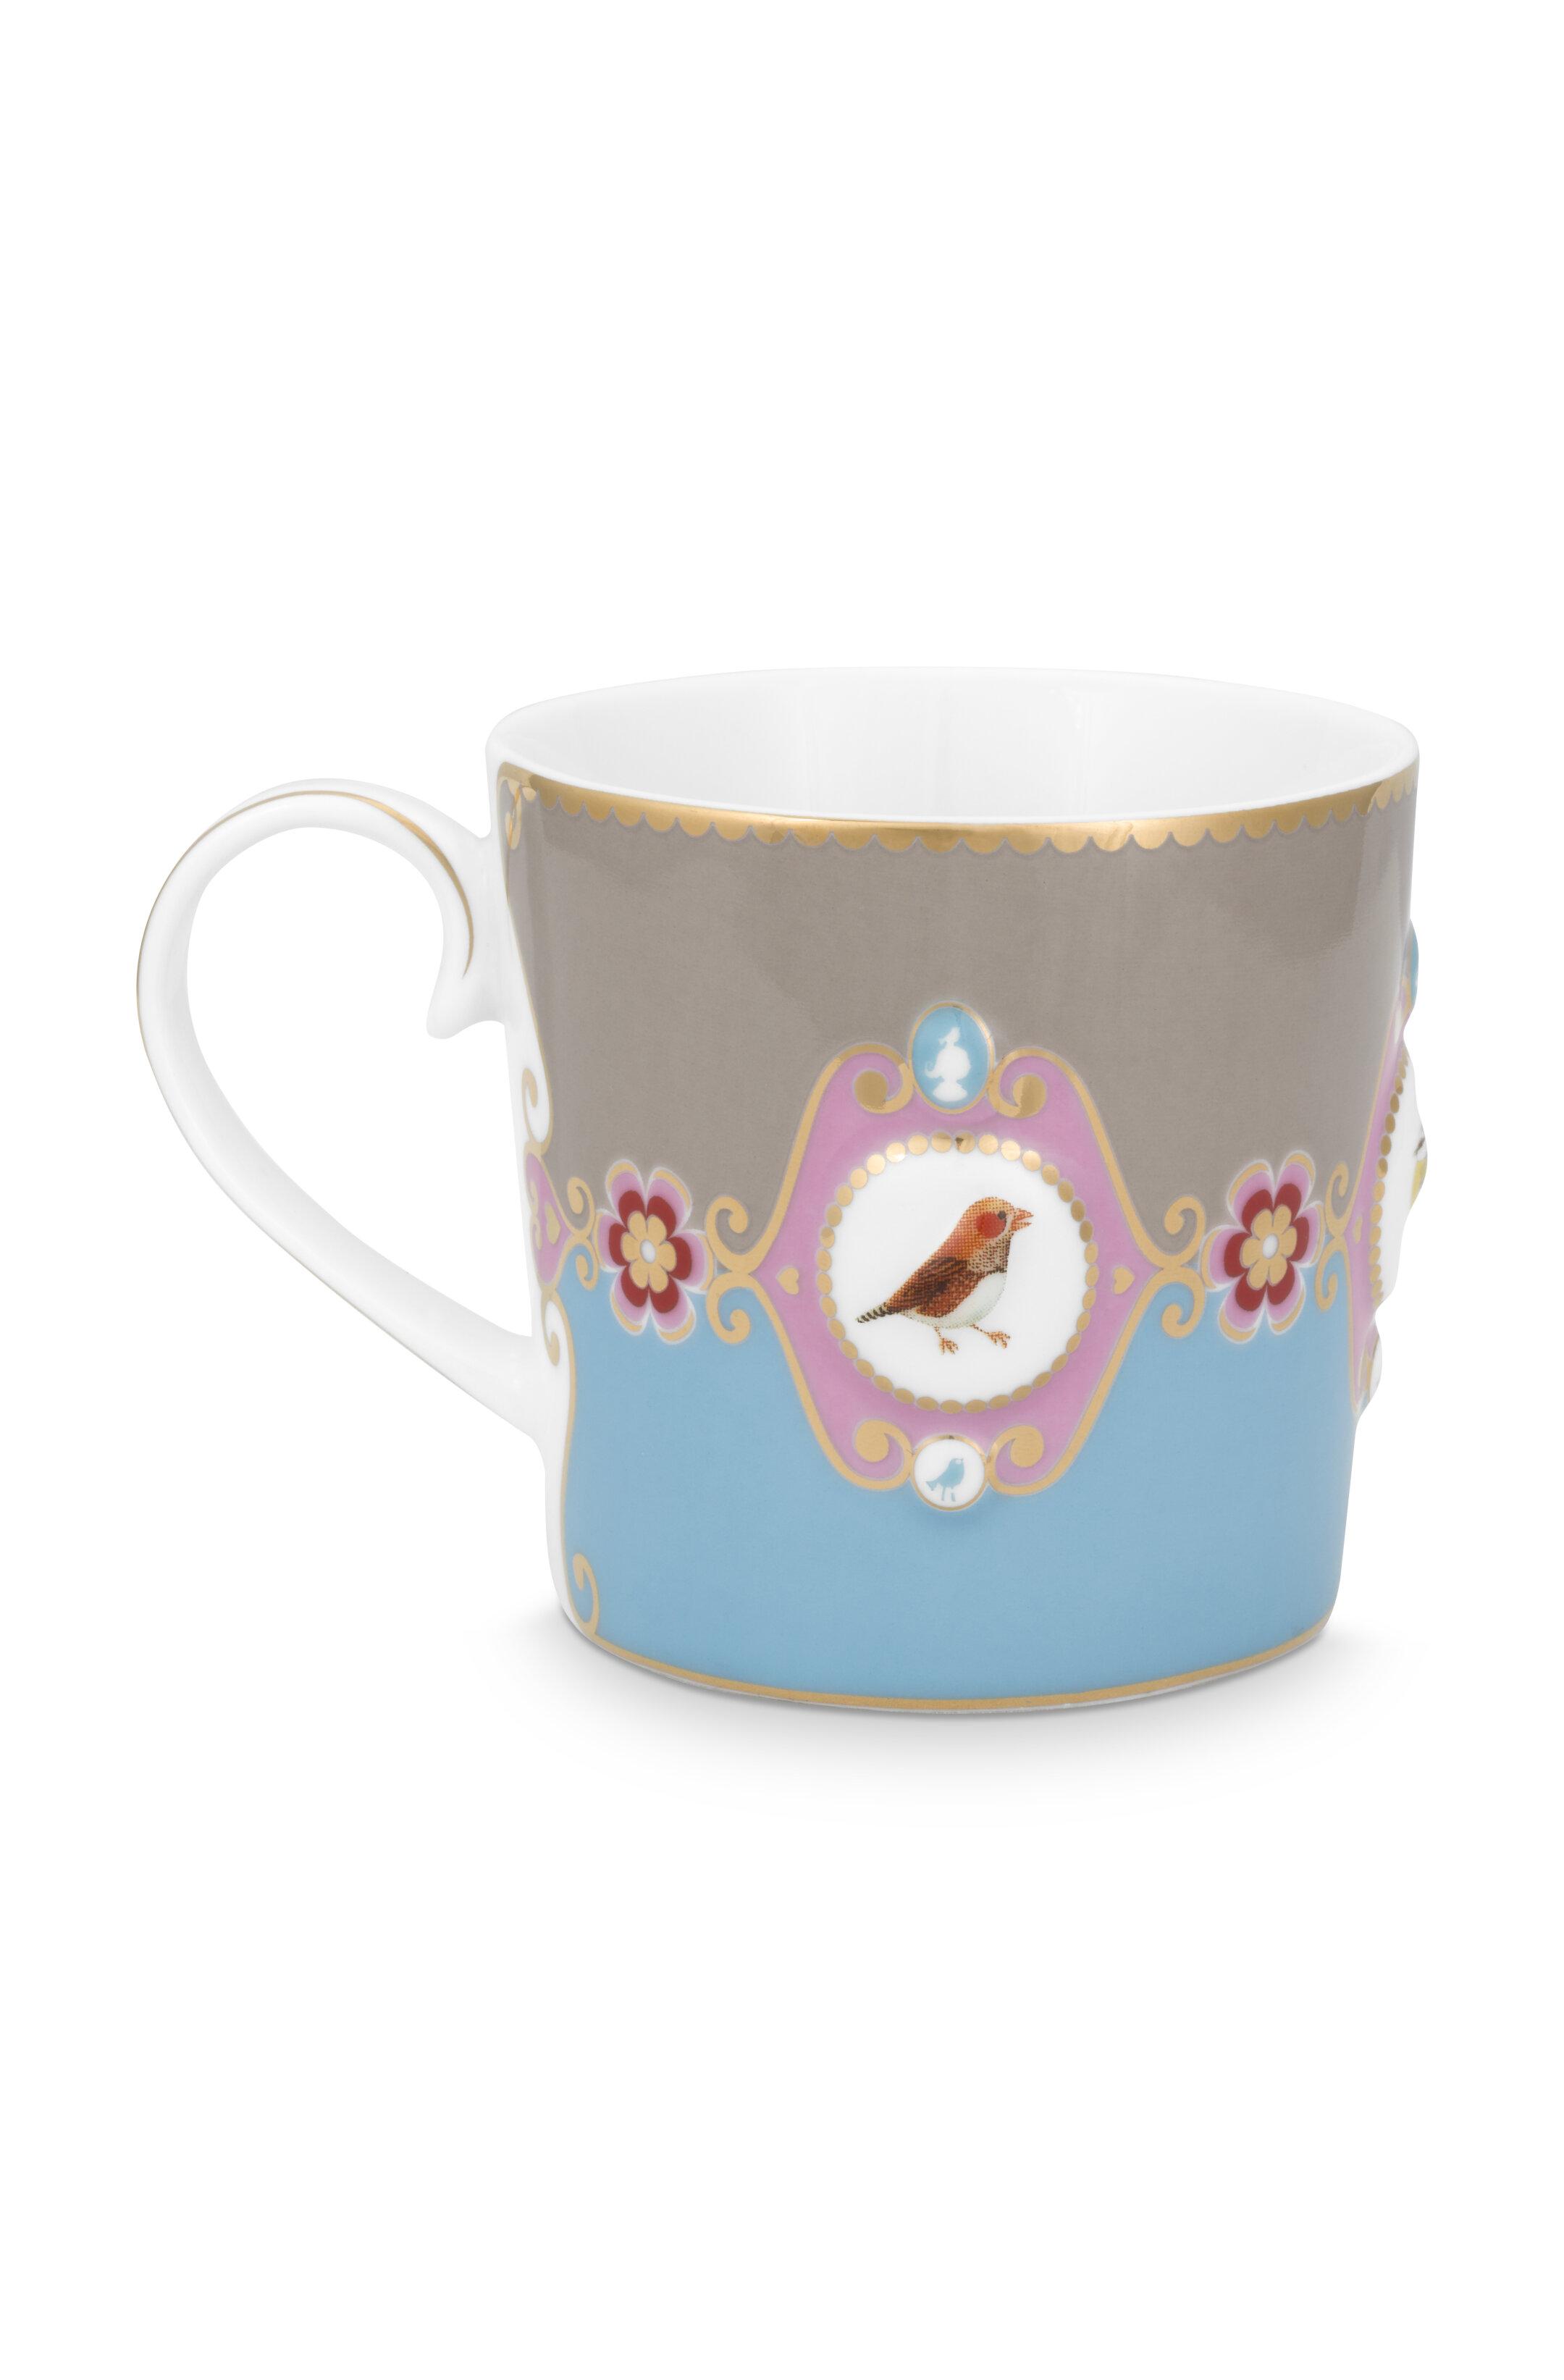 Pip Studio Love Birds Tasse Groß Medaillon Blau-Khaki